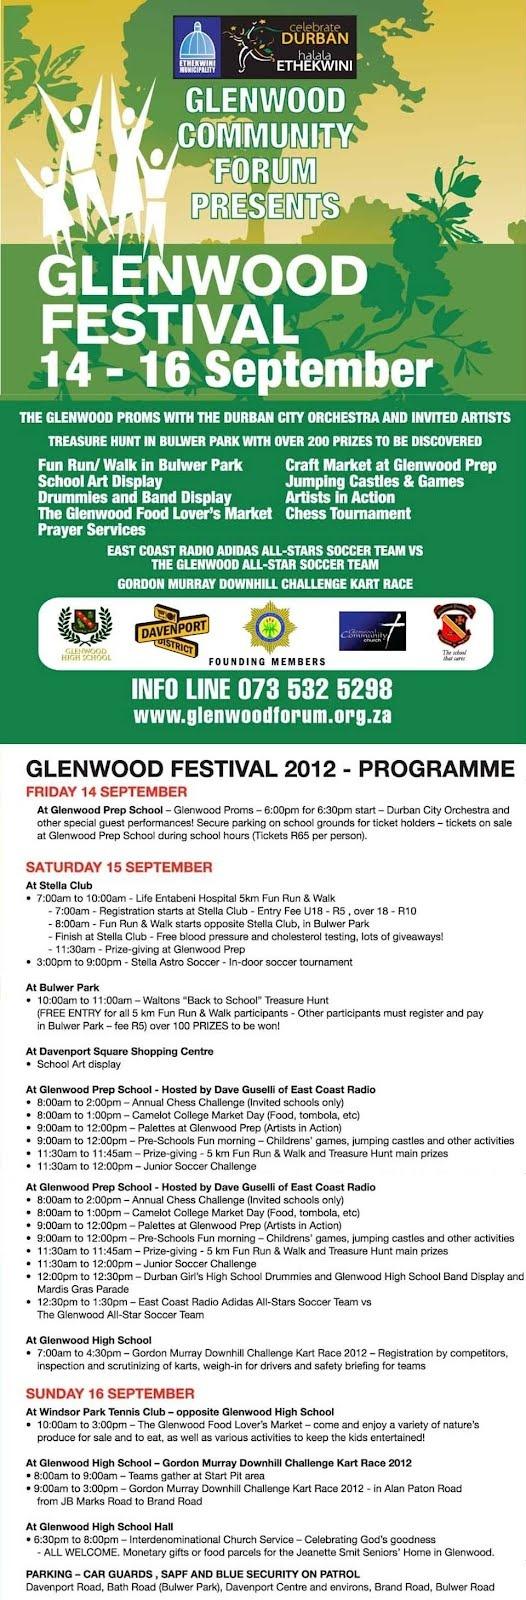 Glenwood Festival Infographic     Glenwood Community Church is a founding member of the Glenwood Community Forum, key organiser of the Glenwood Festival.